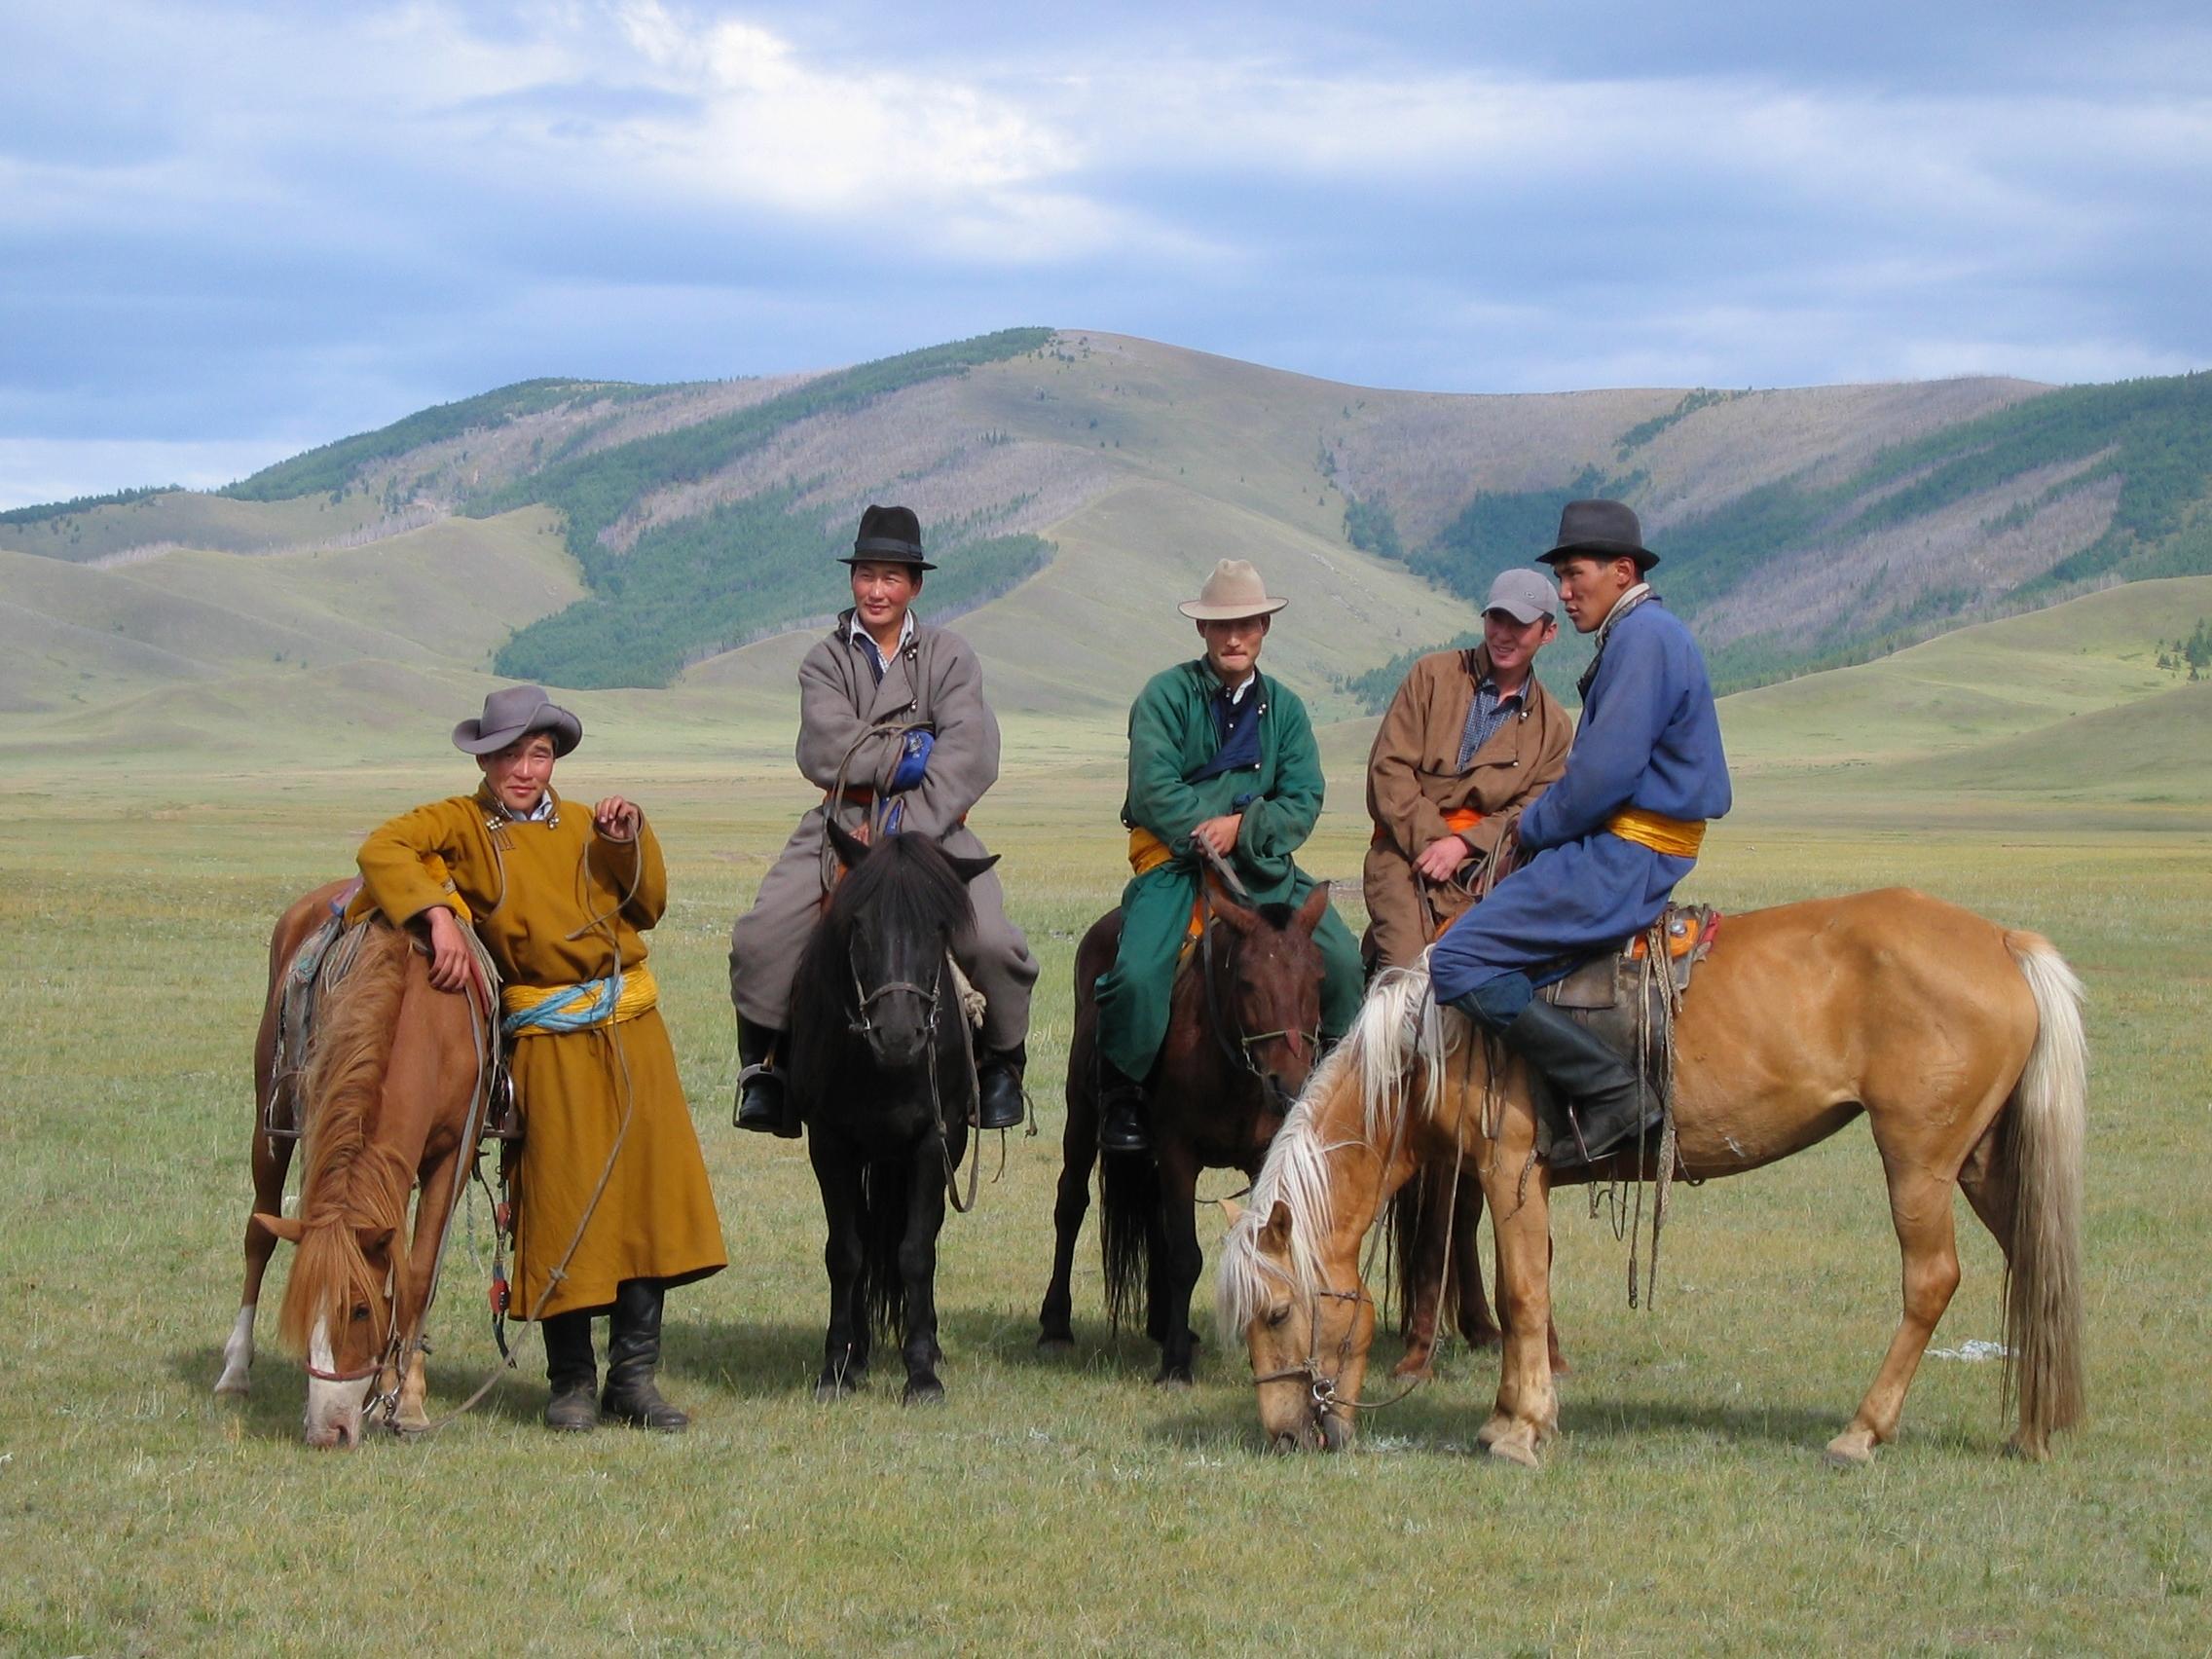 GENGHIS KHAN HORSEBACK RIDING TOUR